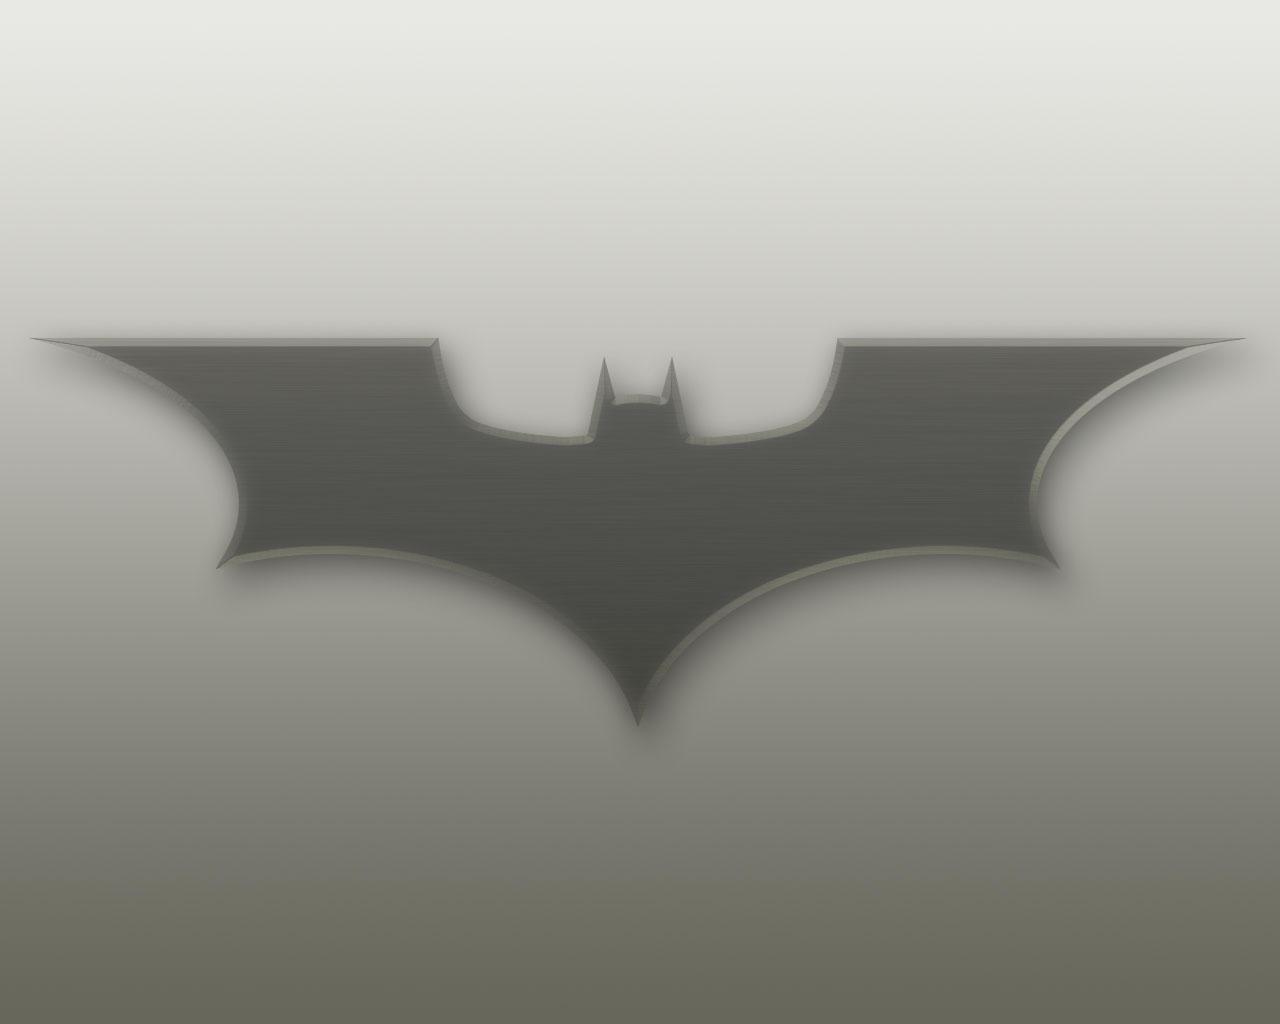 Batman begins logo wallpaper by talon on deviantart batman begins logo wallpaper by talon batman begins logo wallpaper by talon voltagebd Gallery